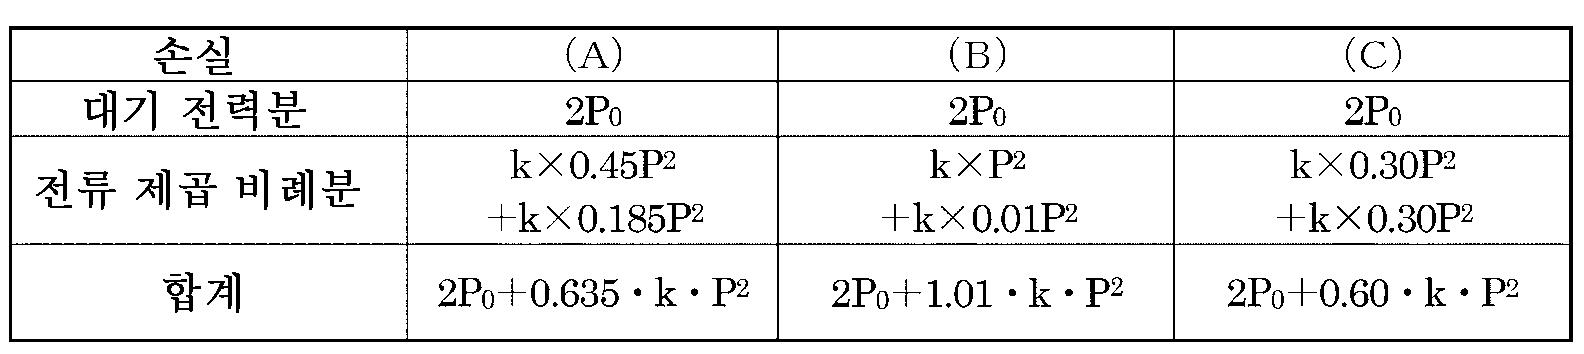 Figure 112015077201928-pct00001